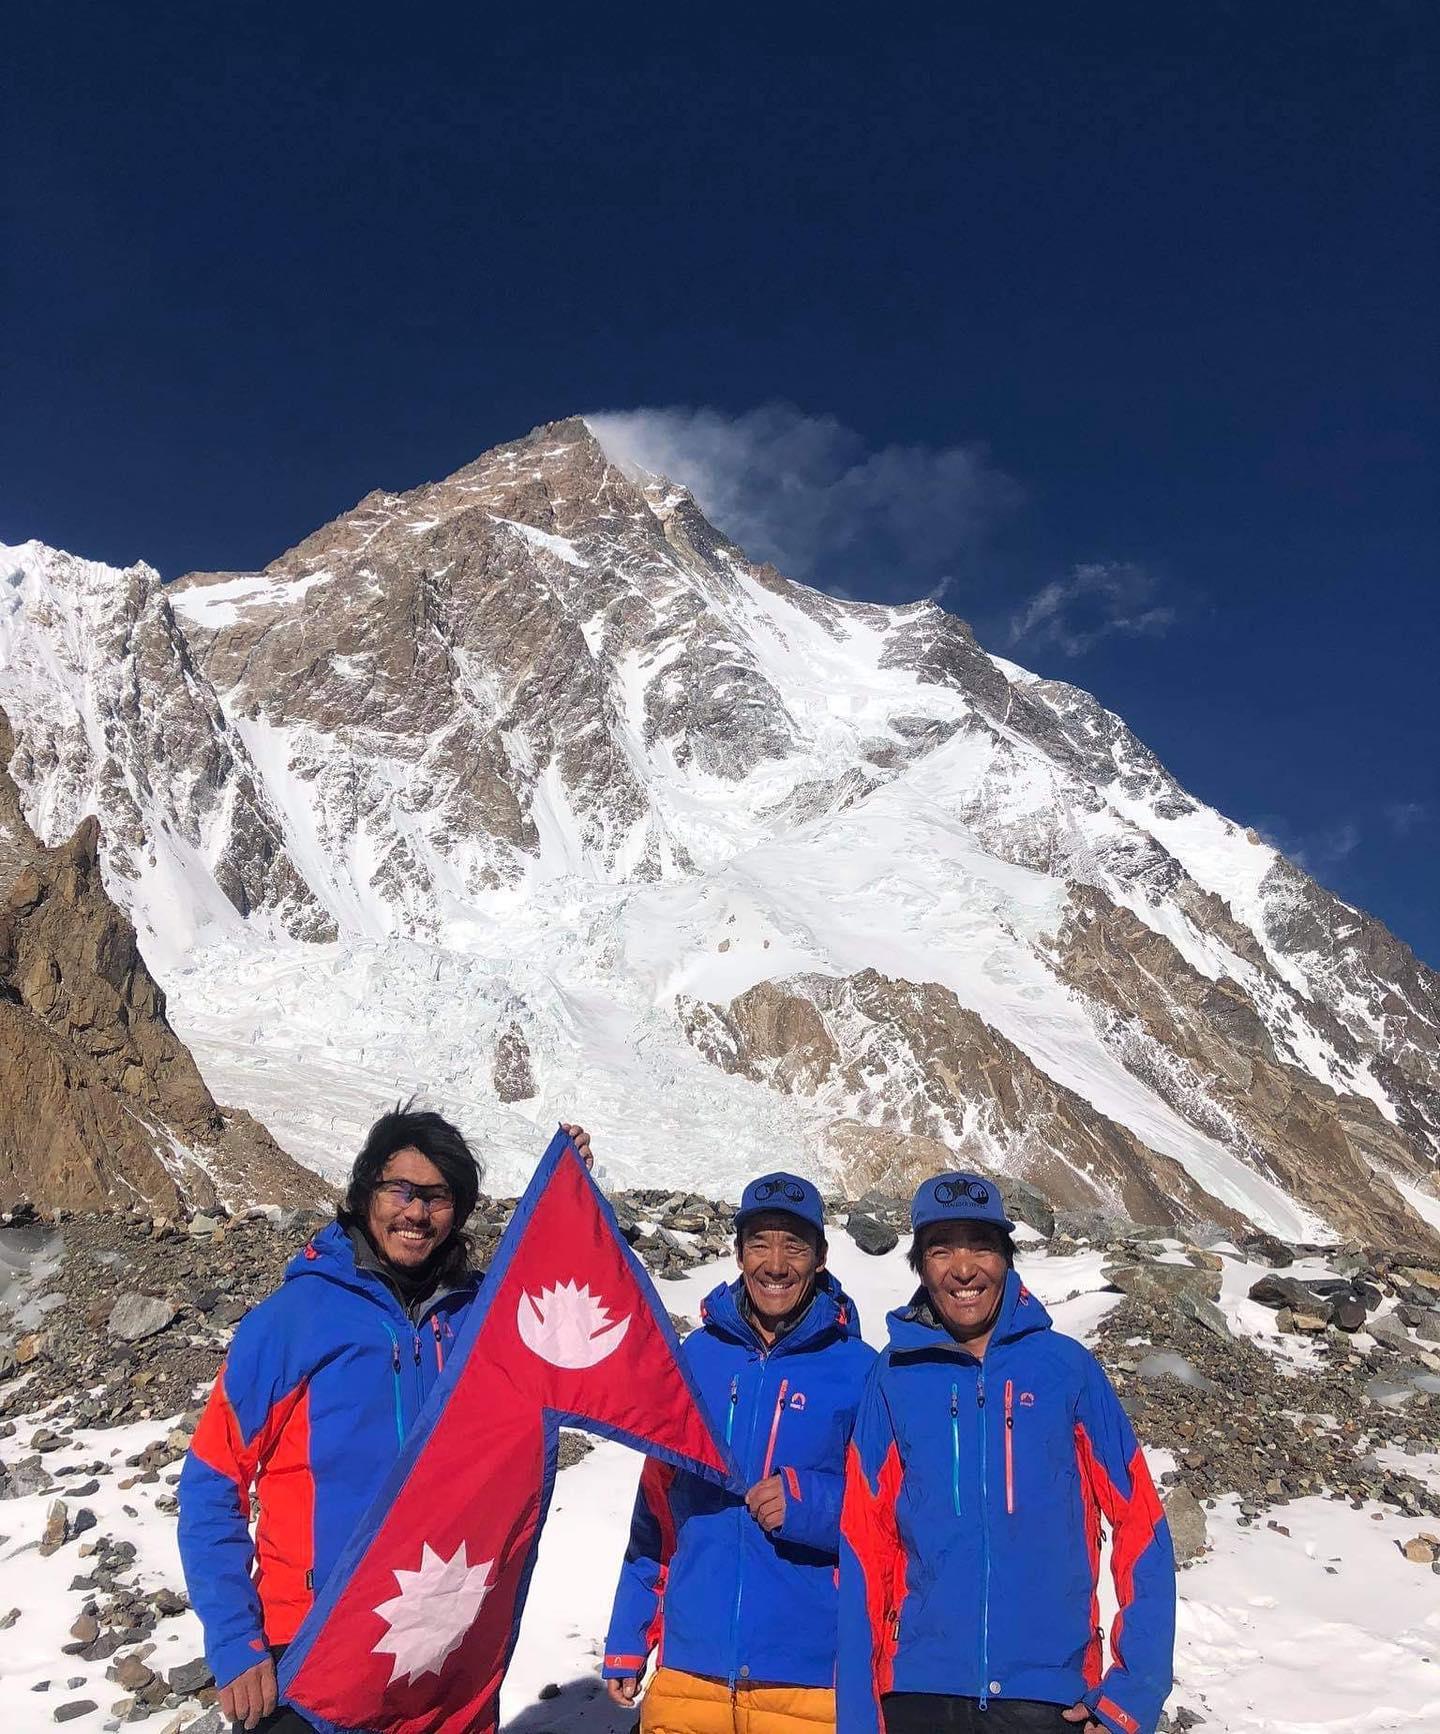 Mingma Gyalje with his Nepali Sherpa climbers' team on Mt K2. Photo Courtesy: Mingma Gyalje